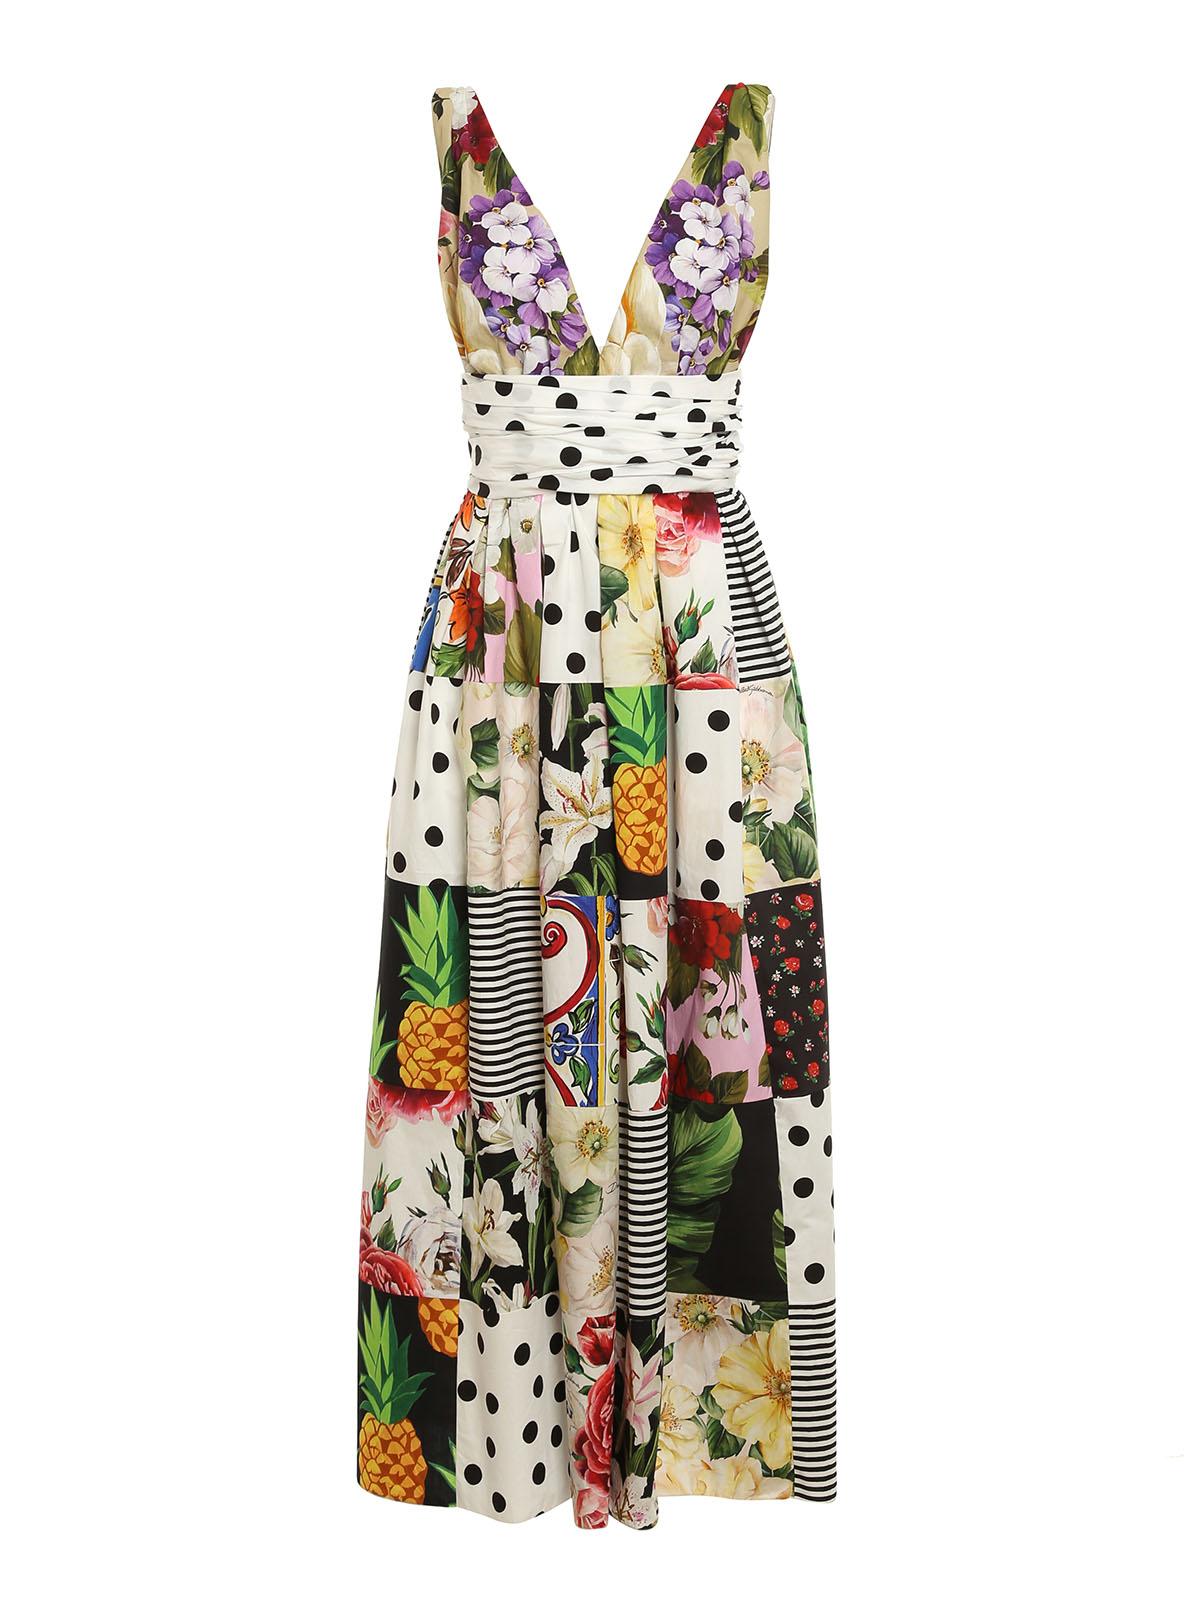 Dolce & Gabbana Cottons PATCHWORK PATTERNED DRESS